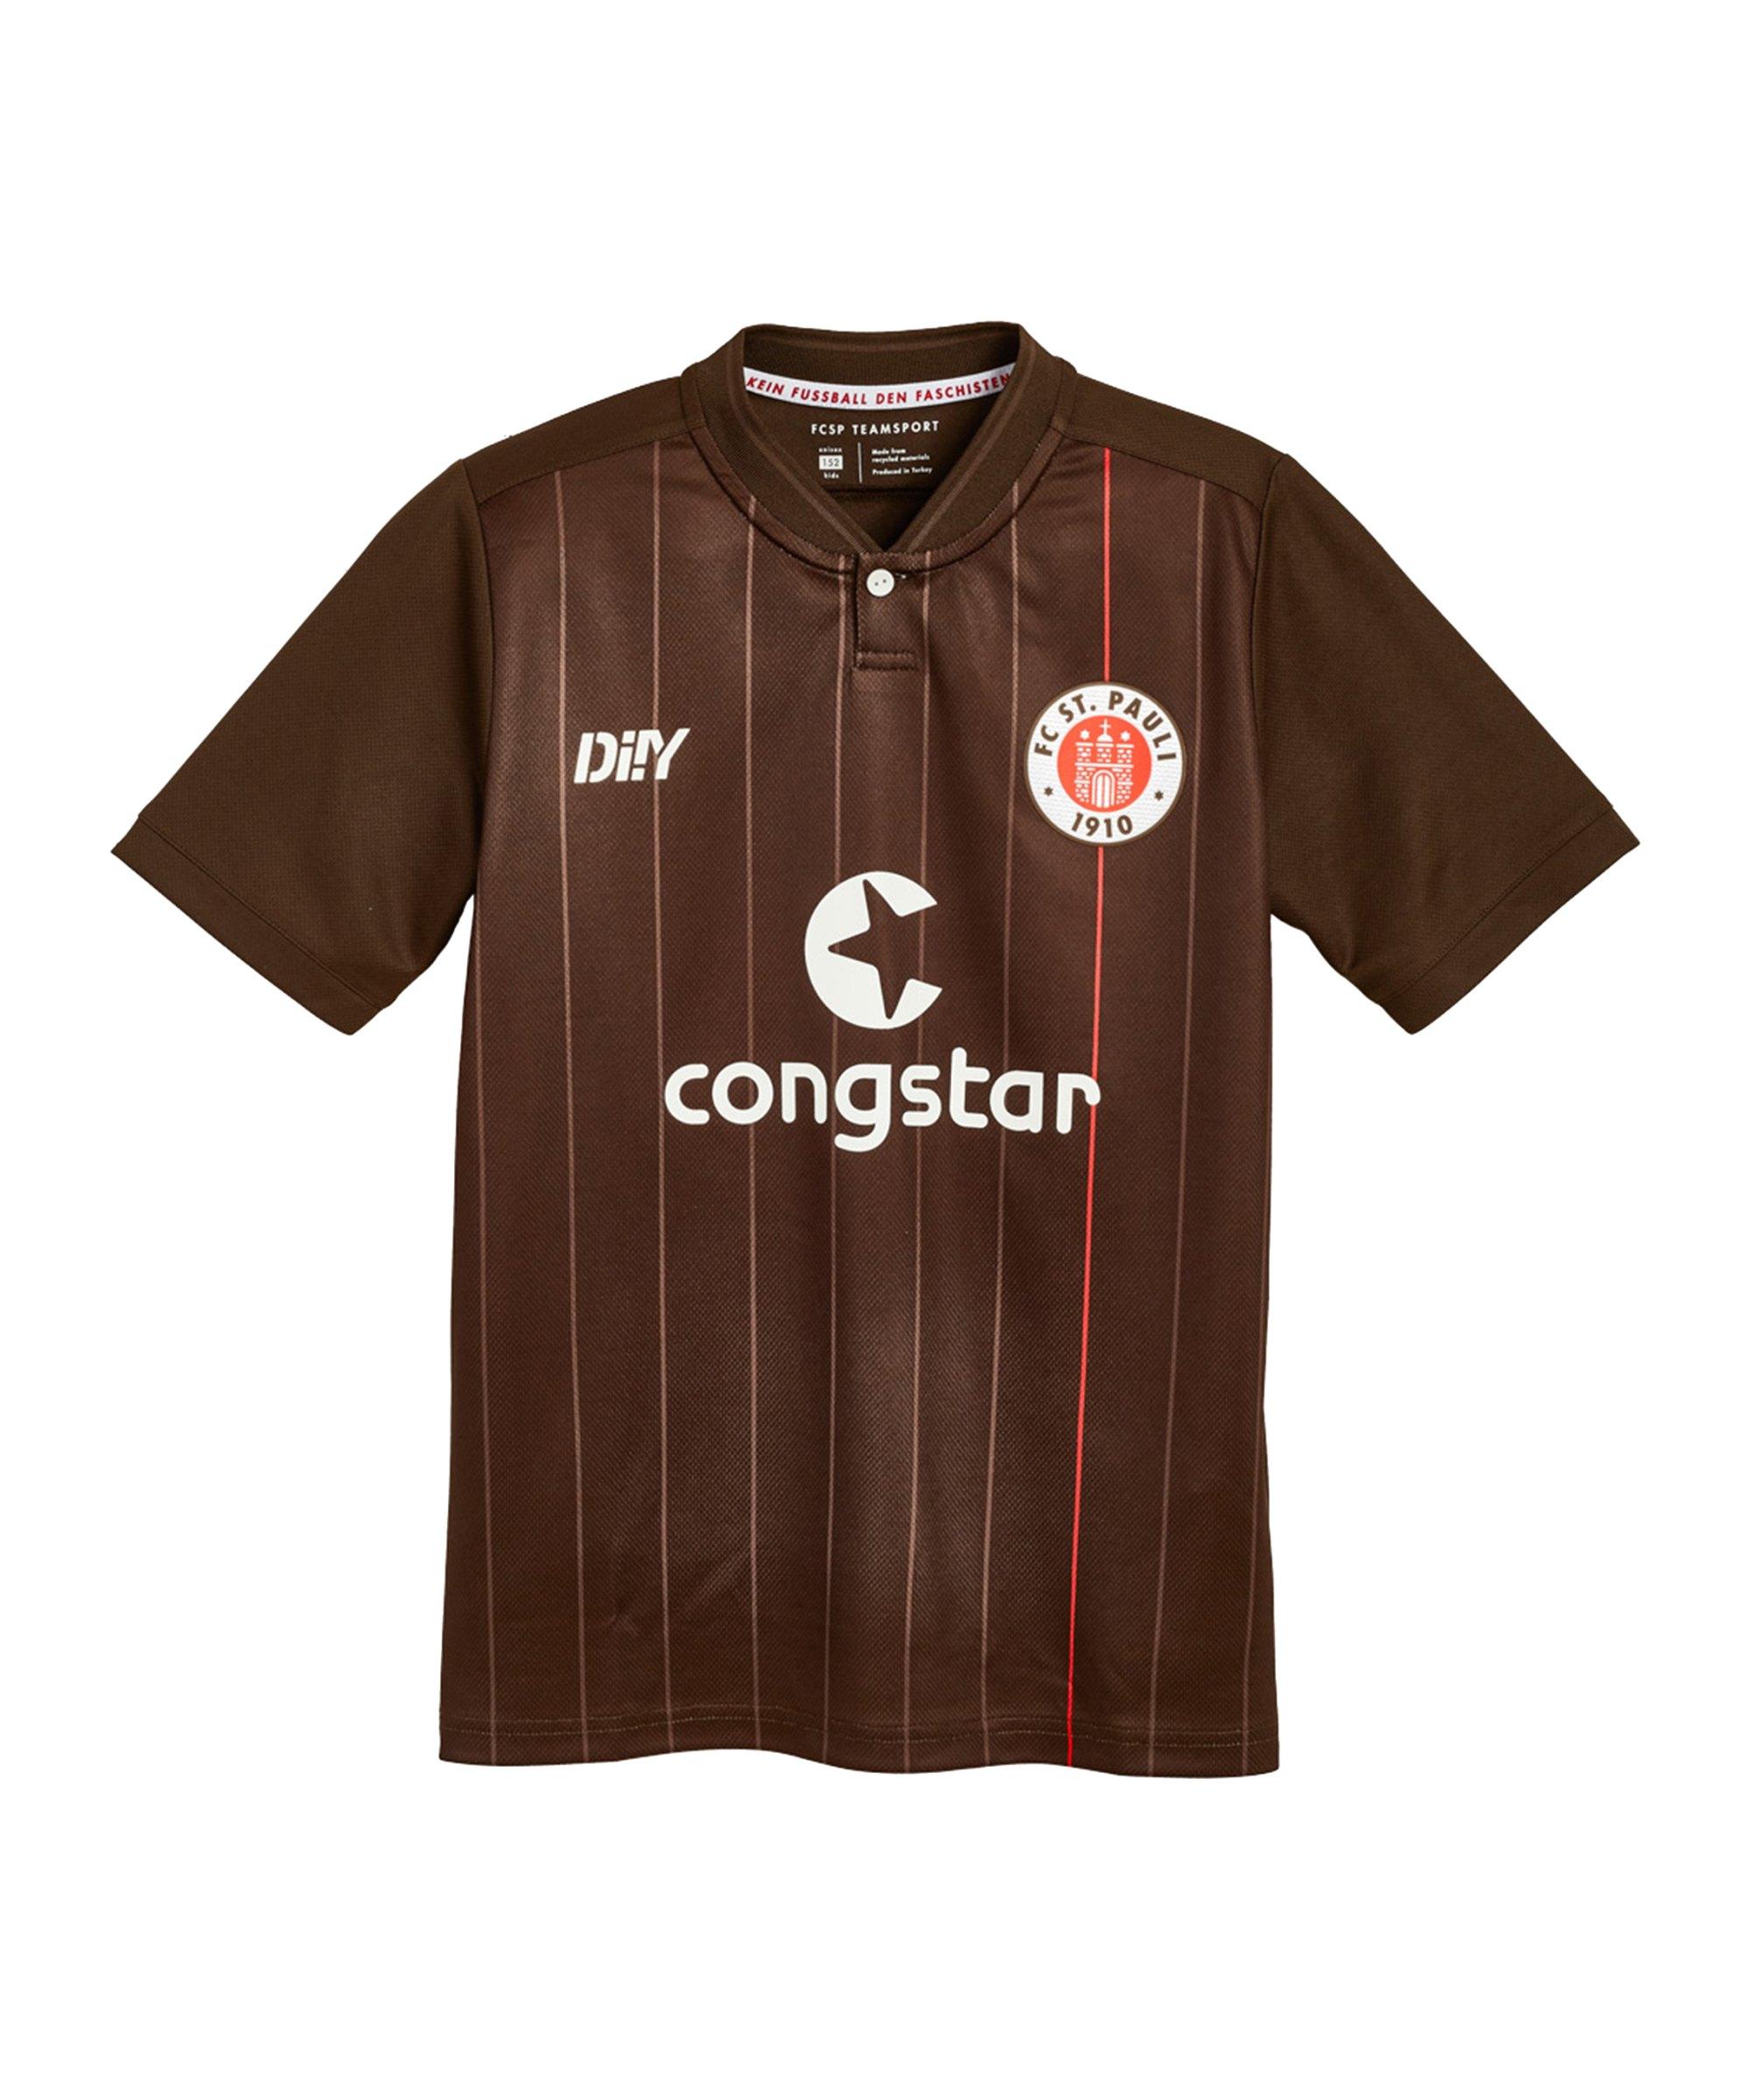 DIIY FC St. Pauli Trikot Home 2021/2022 Kids Braun - braun